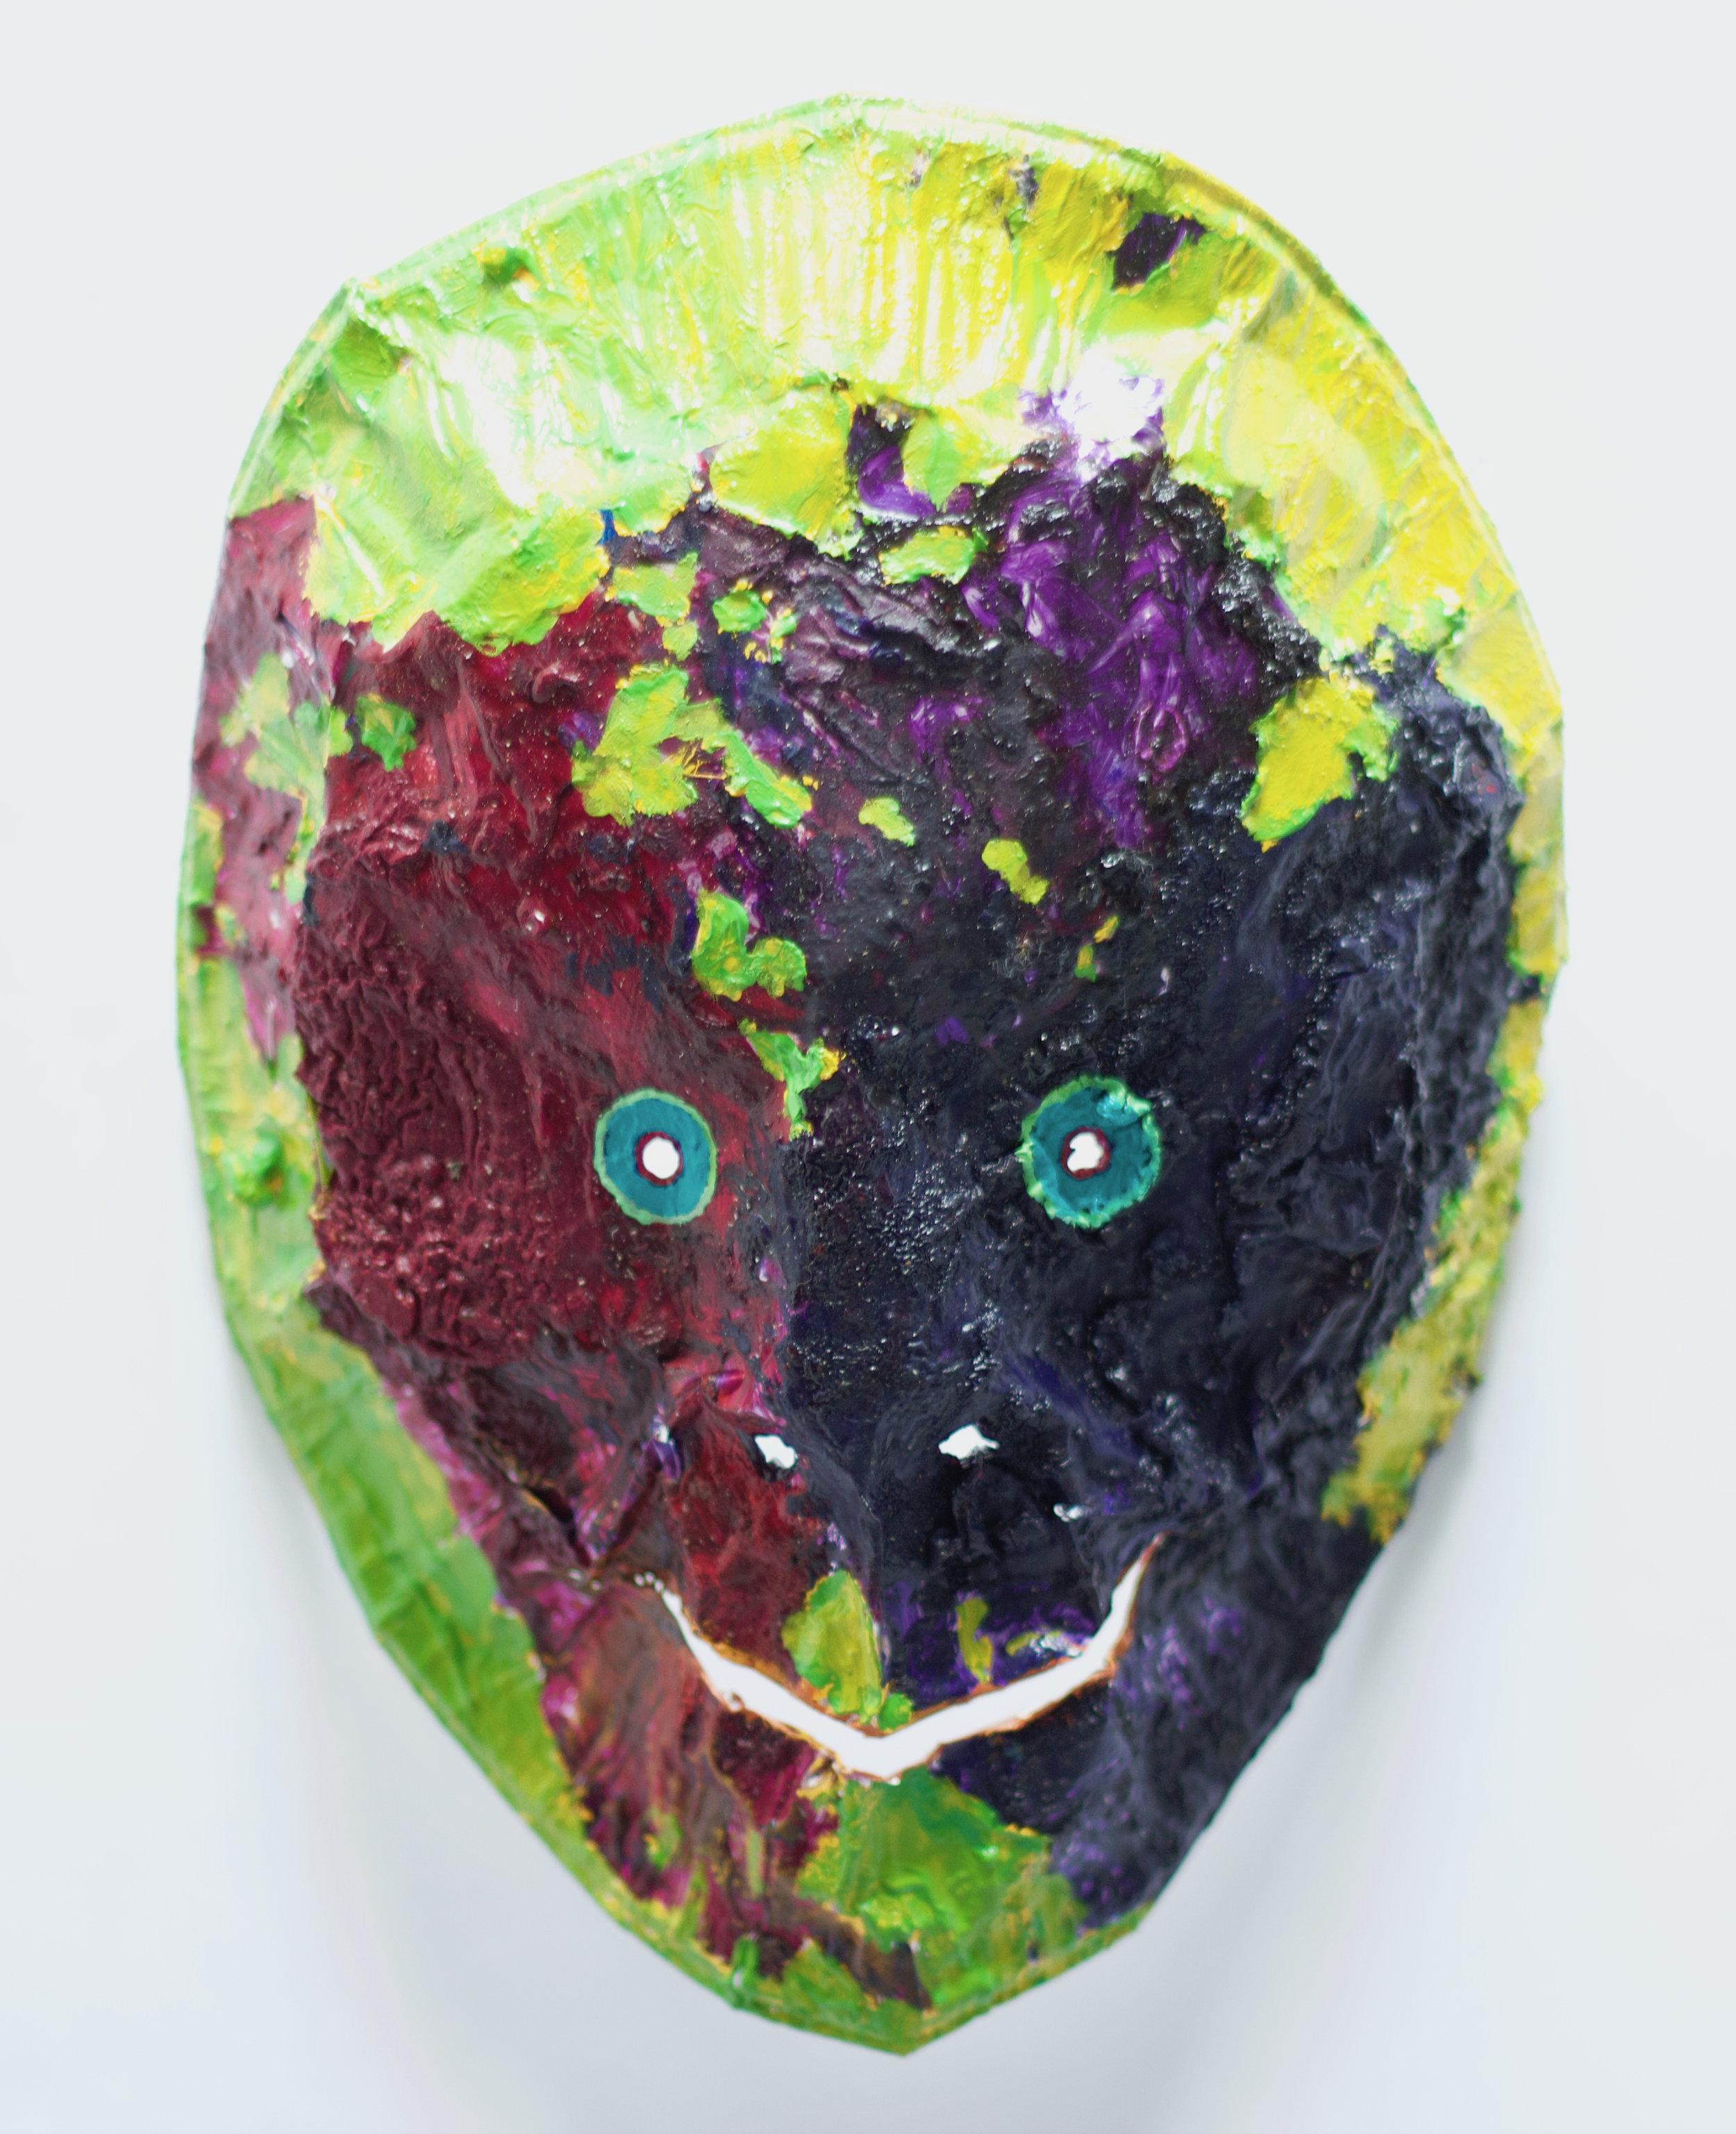 Painters Palette Smiling Zombie Mask 2